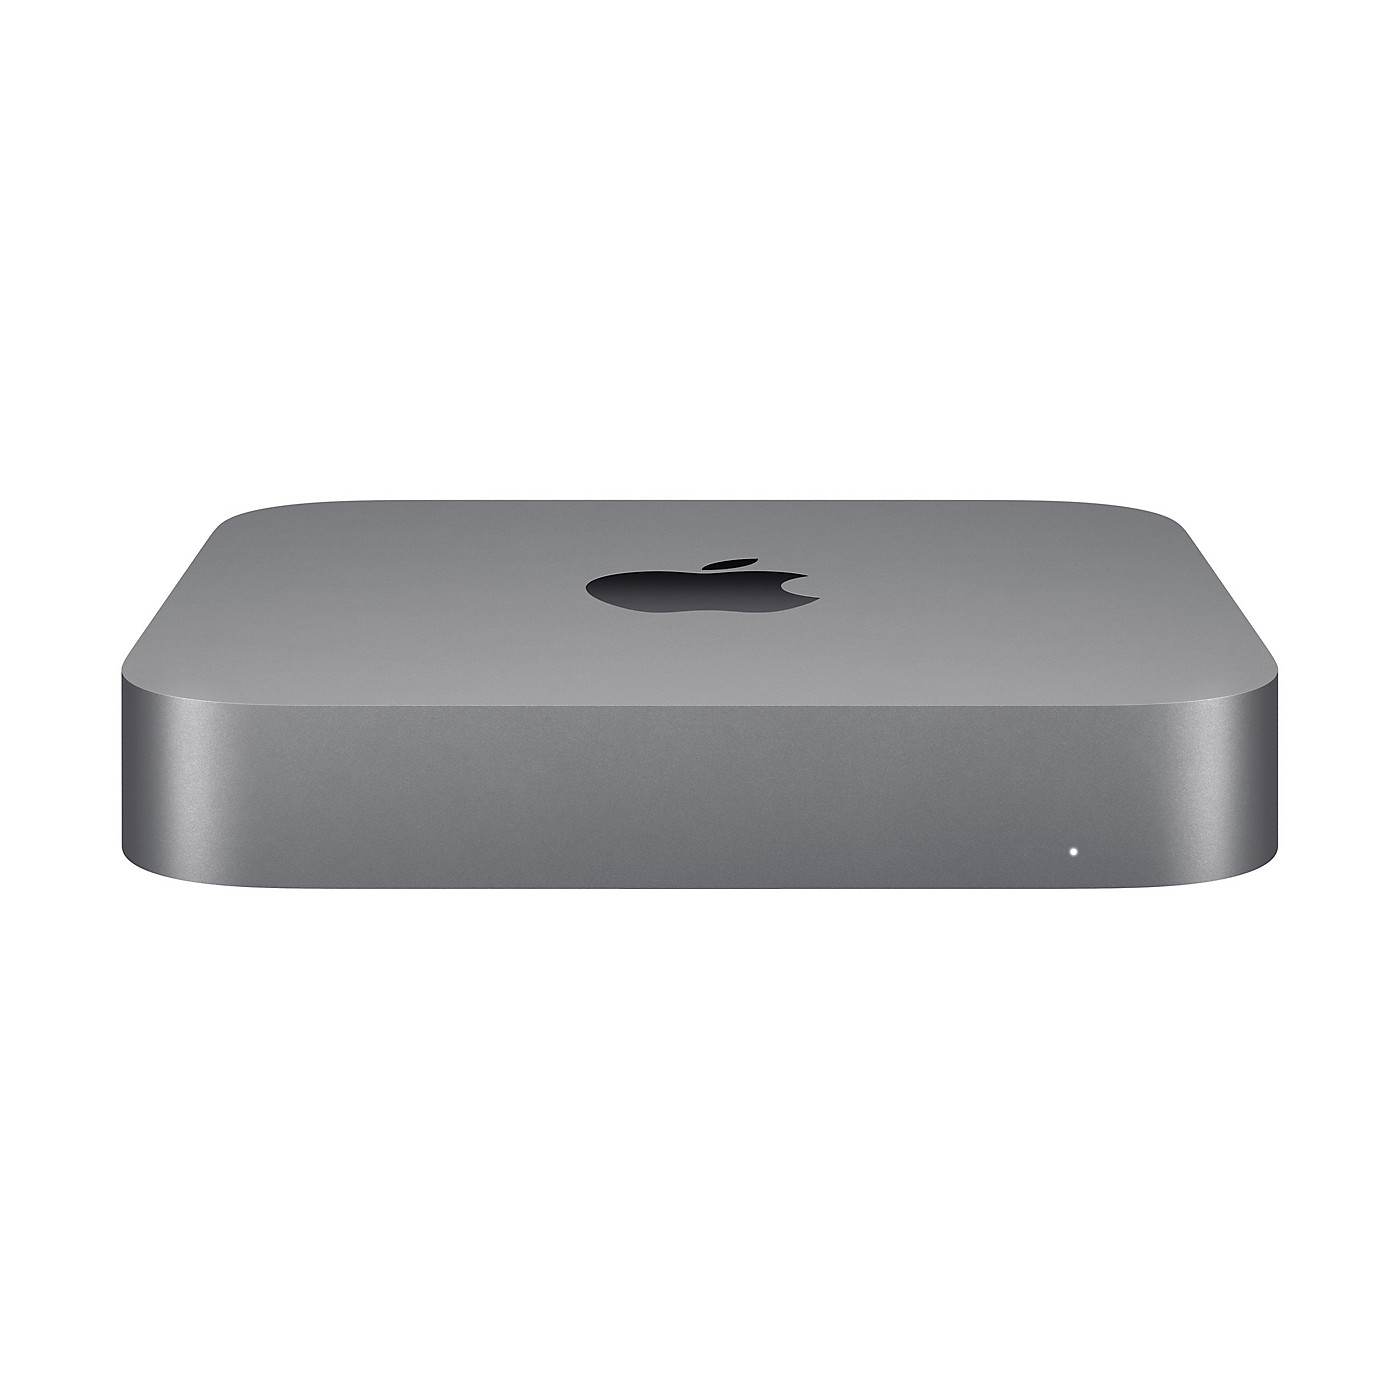 Apple Mac Mini 3.0GHZ I5 6-CORE 8GB/512GB in Space Gray thumbnail